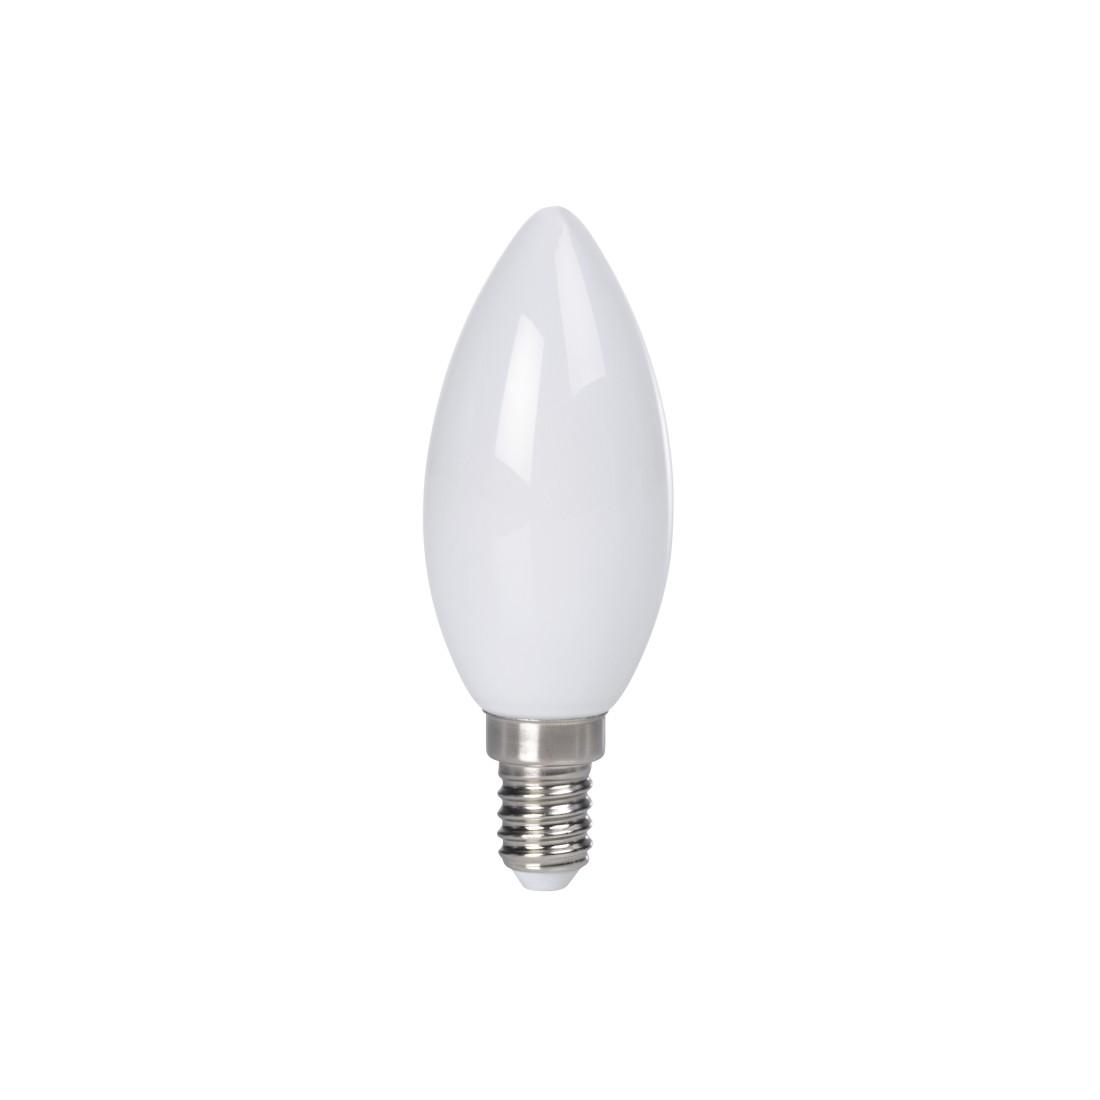 xavax.eu | 00112227 Xavax LED-Lampe, E14, 250lm ersetzt 25W ...